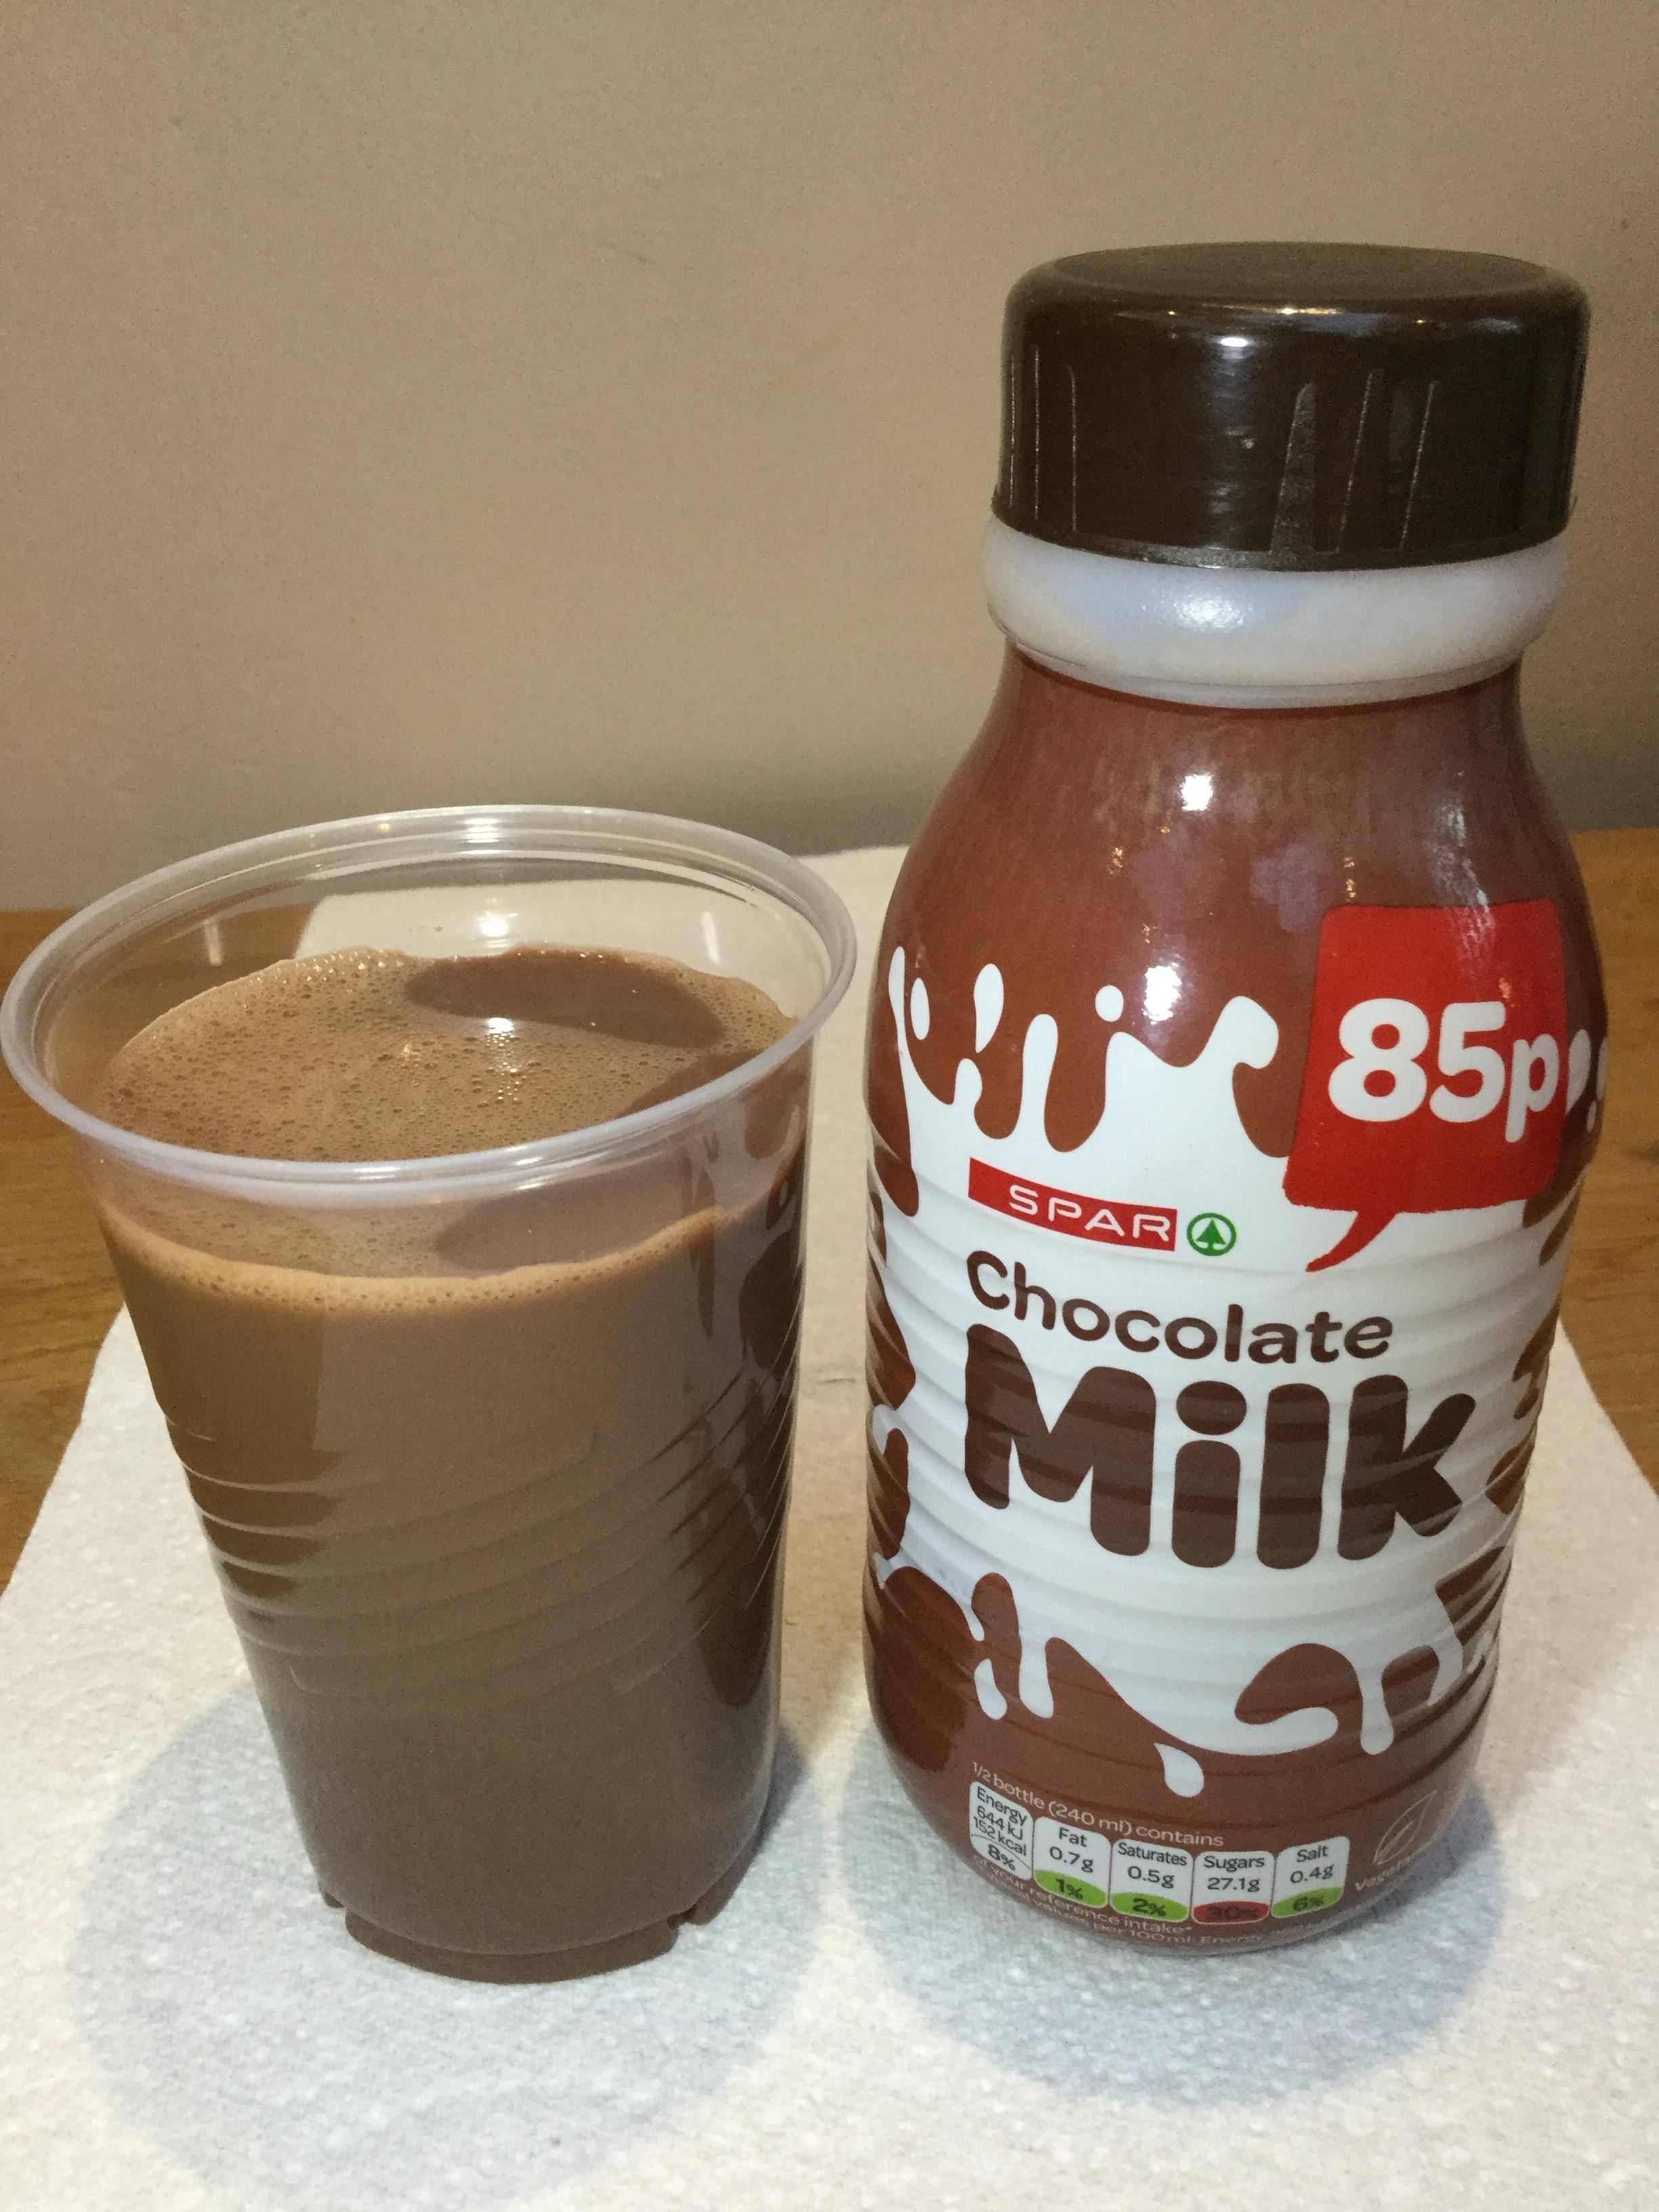 Spar Chocolate Milk Cup